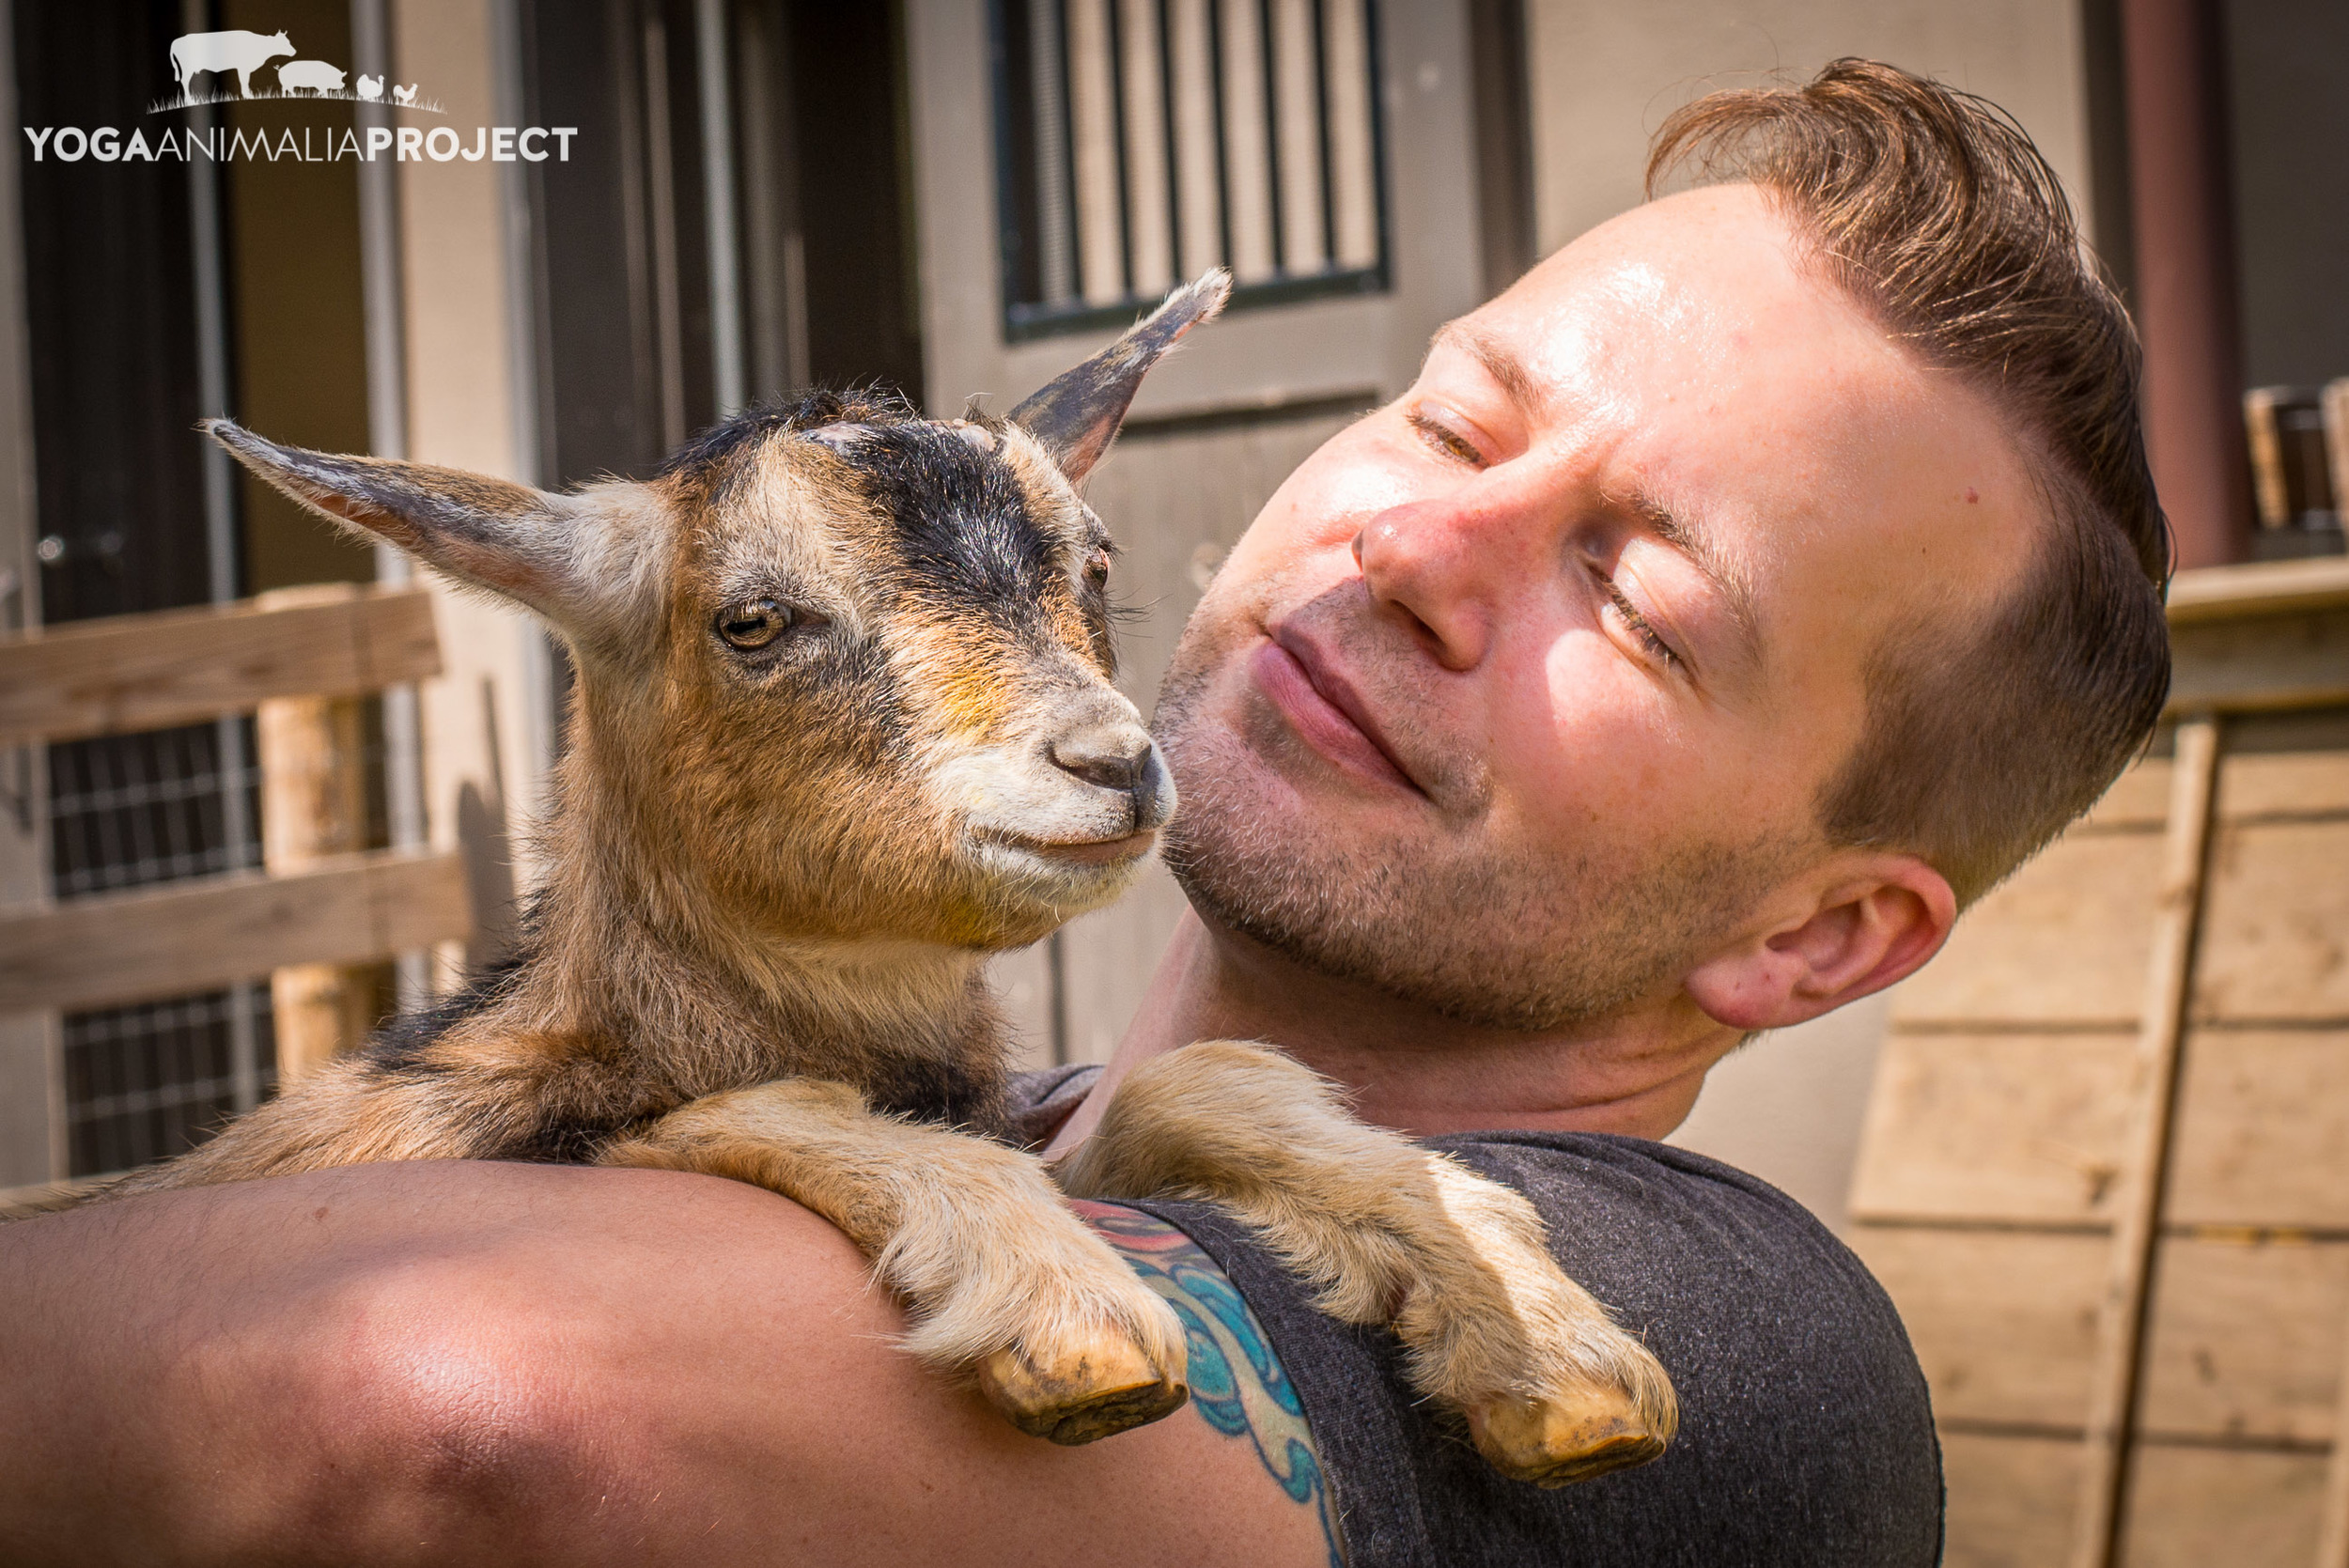 Avery with his namesake, Farm Sanctuary, Watkins Glen, New York